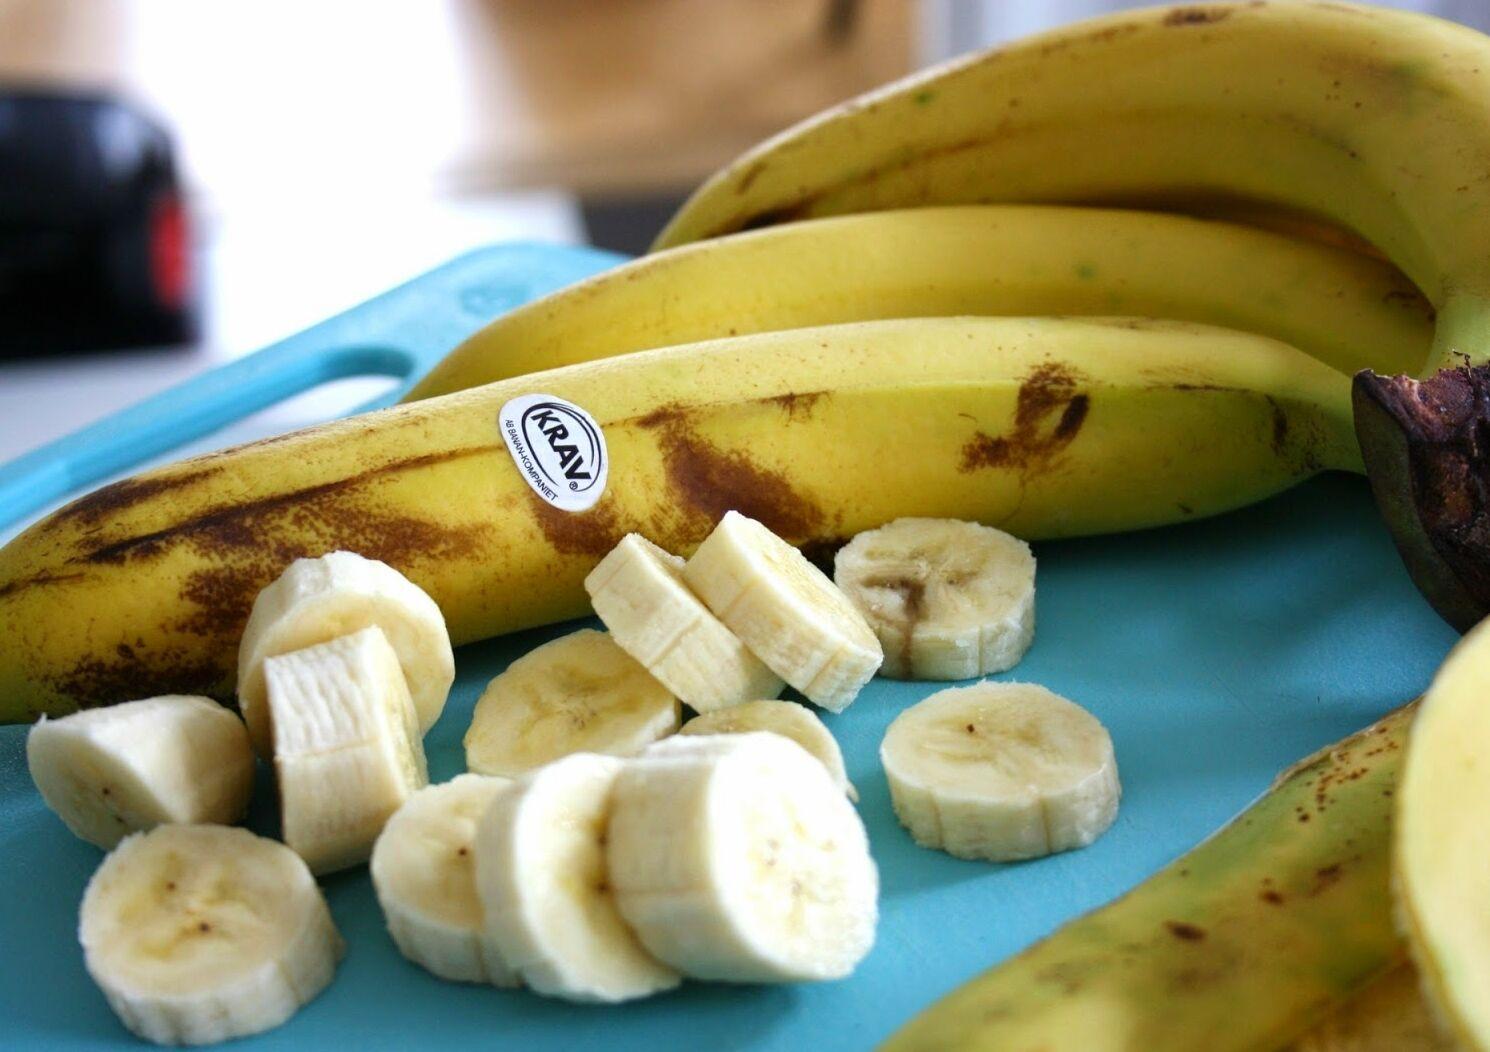 frysa in banan